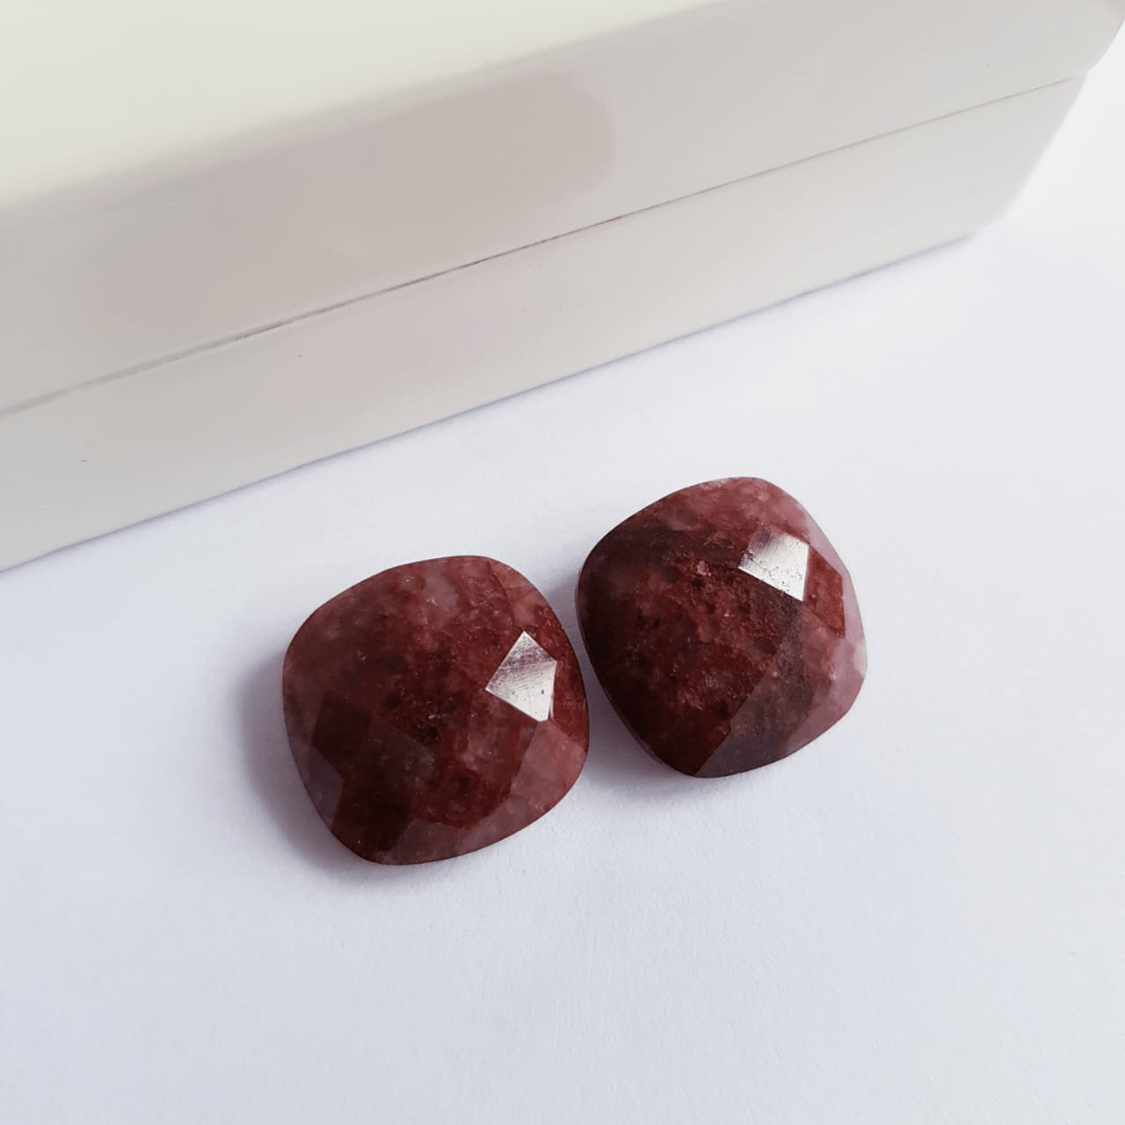 2-Brinco pedra natural quartzo marrom -formato quadrado